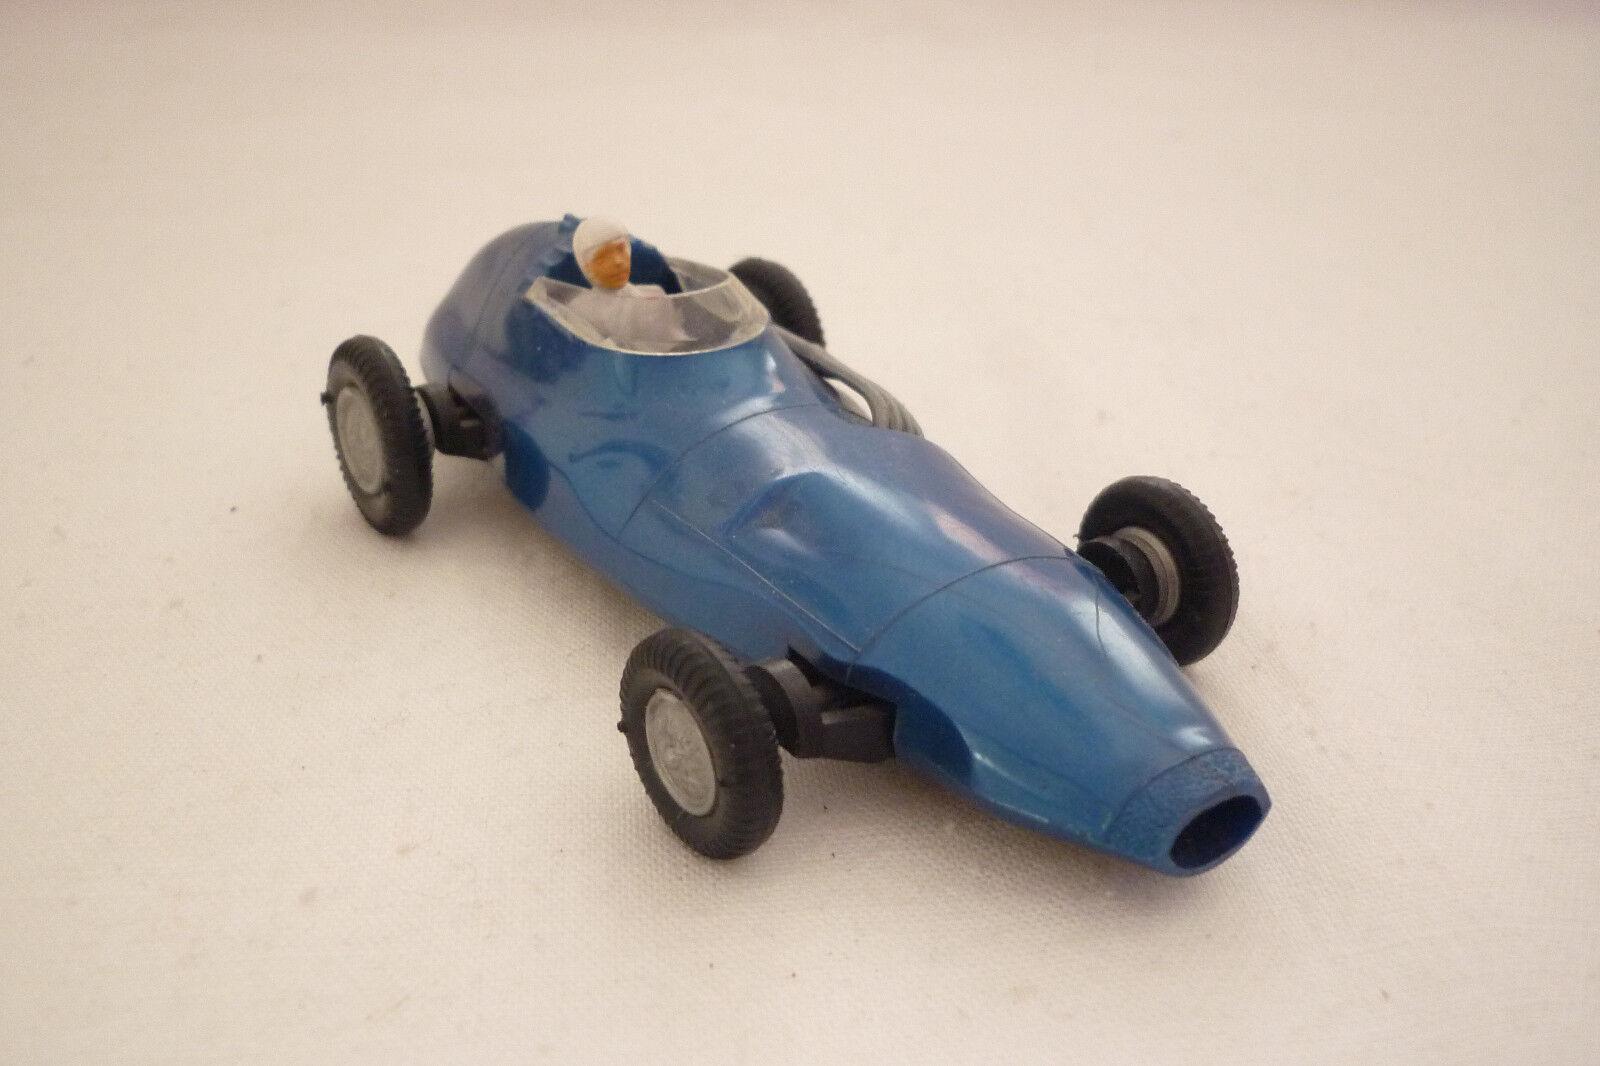 POLITOYS - Vintage kunststoffmodell -Vanwall- 1 41 - ( poli poli poli 20) efa489